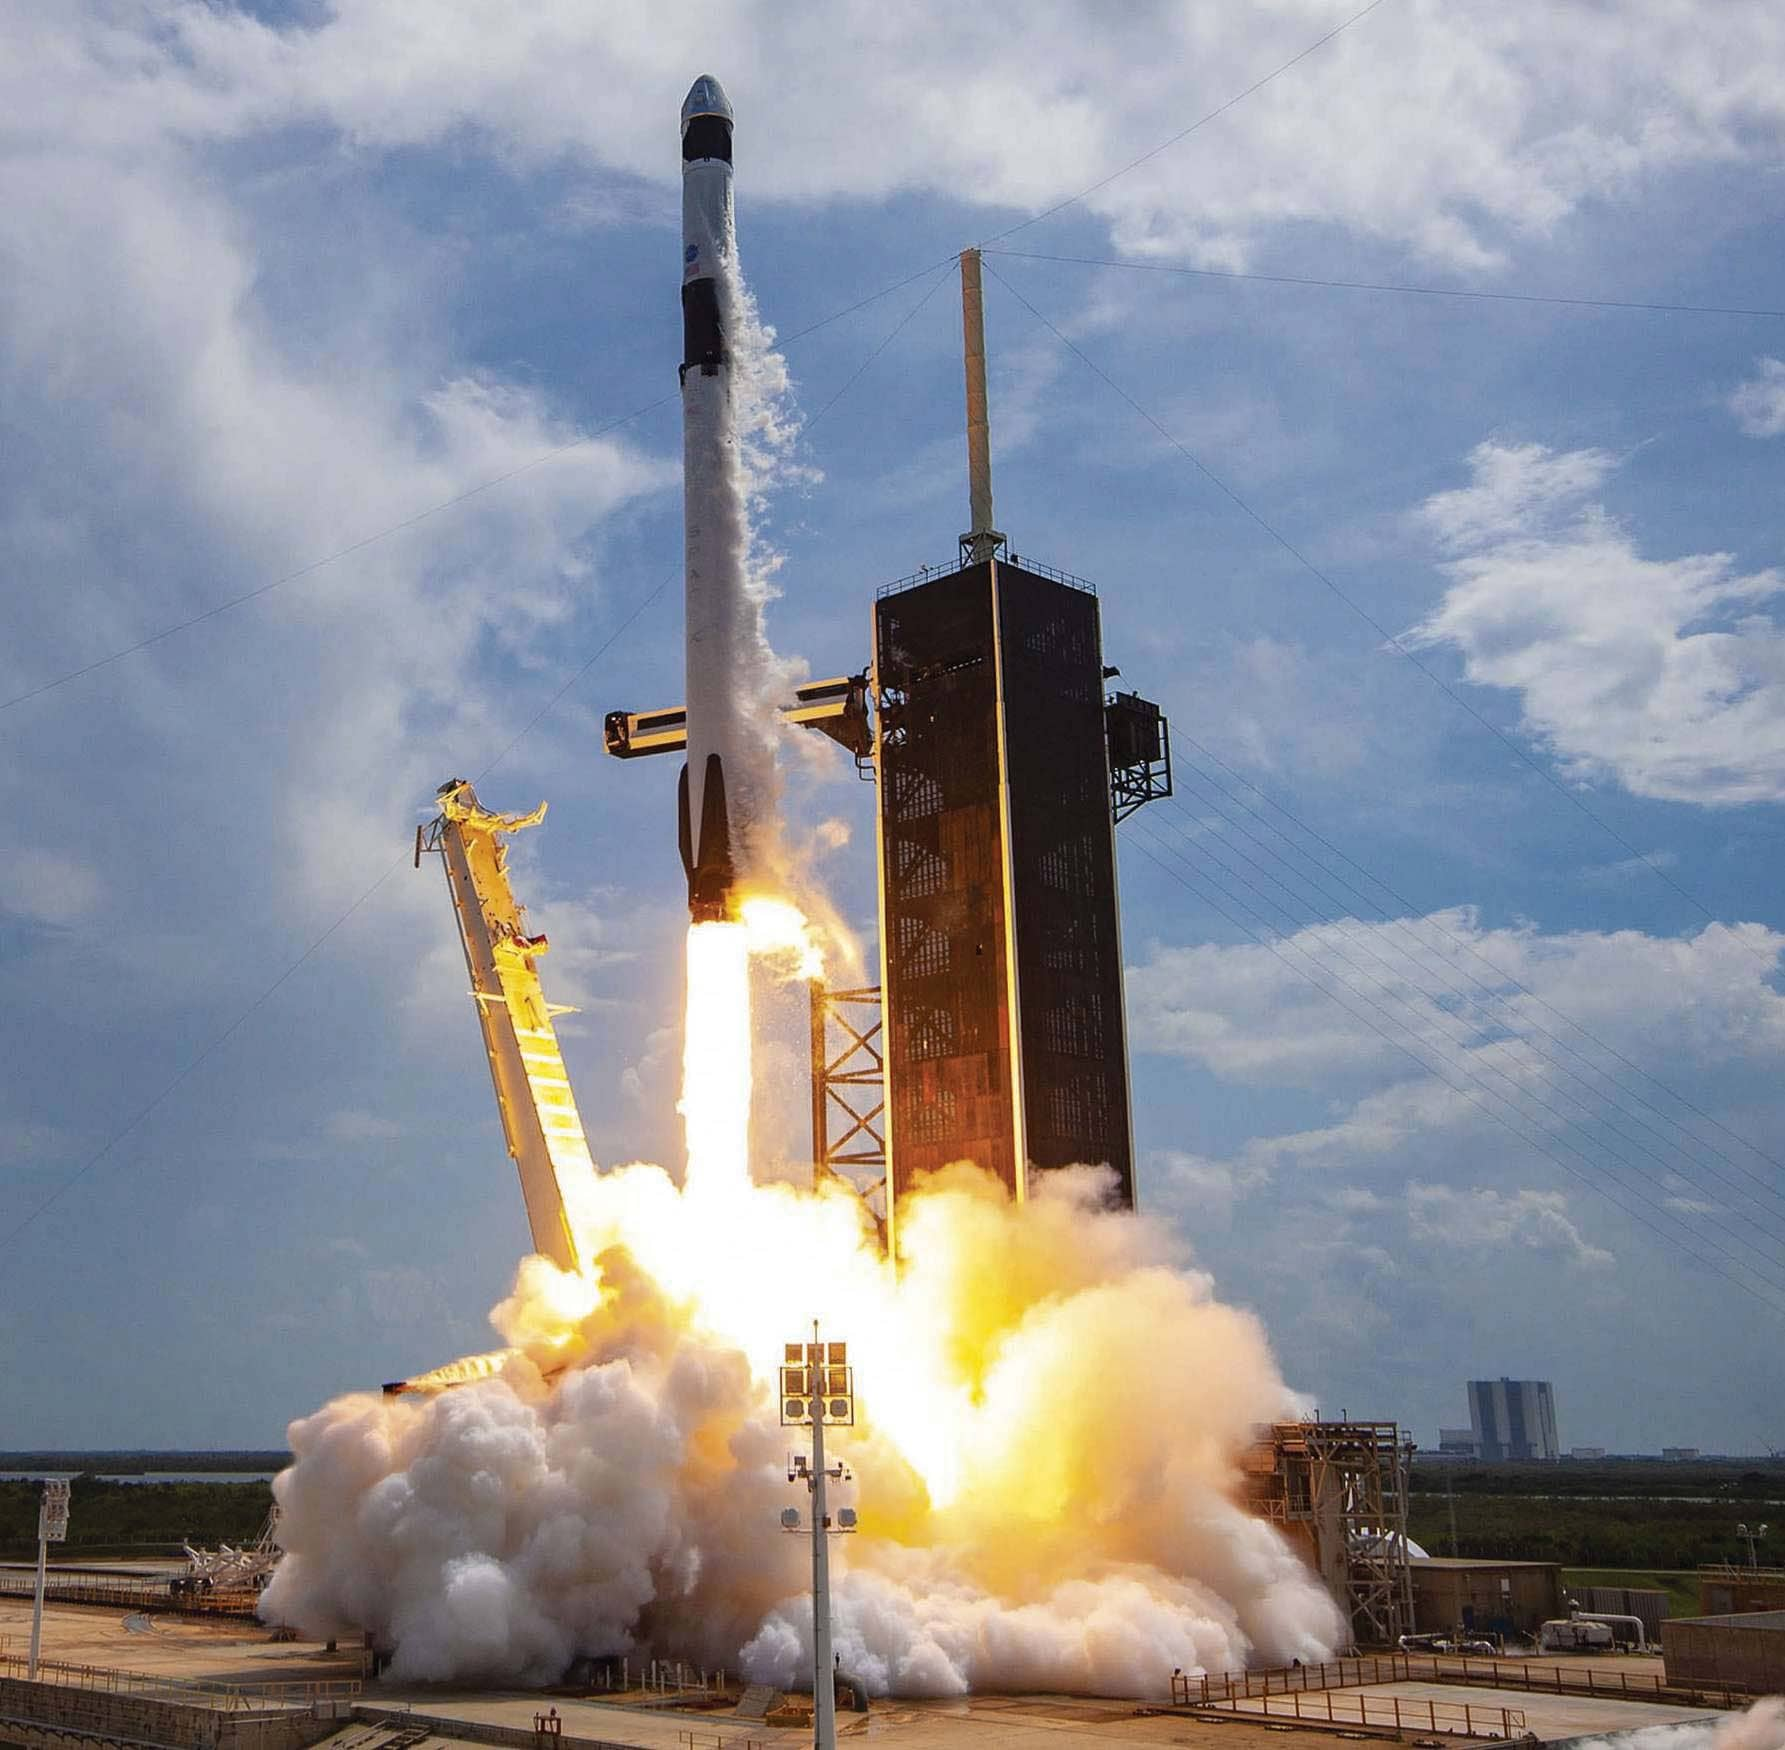 SpaceX craft completes its landmark flight